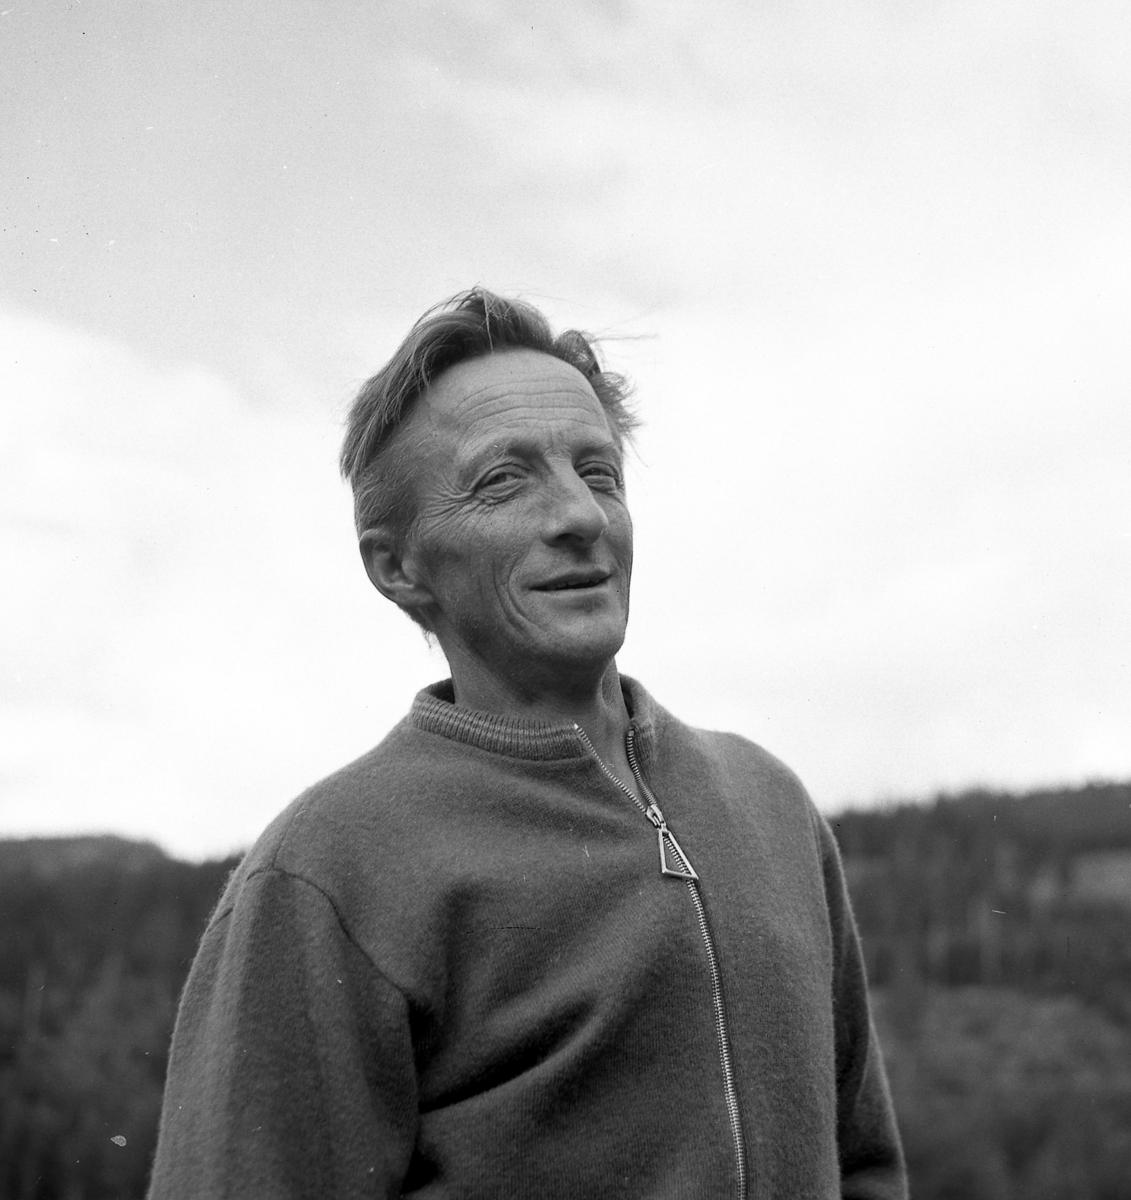 Harald Nymoen